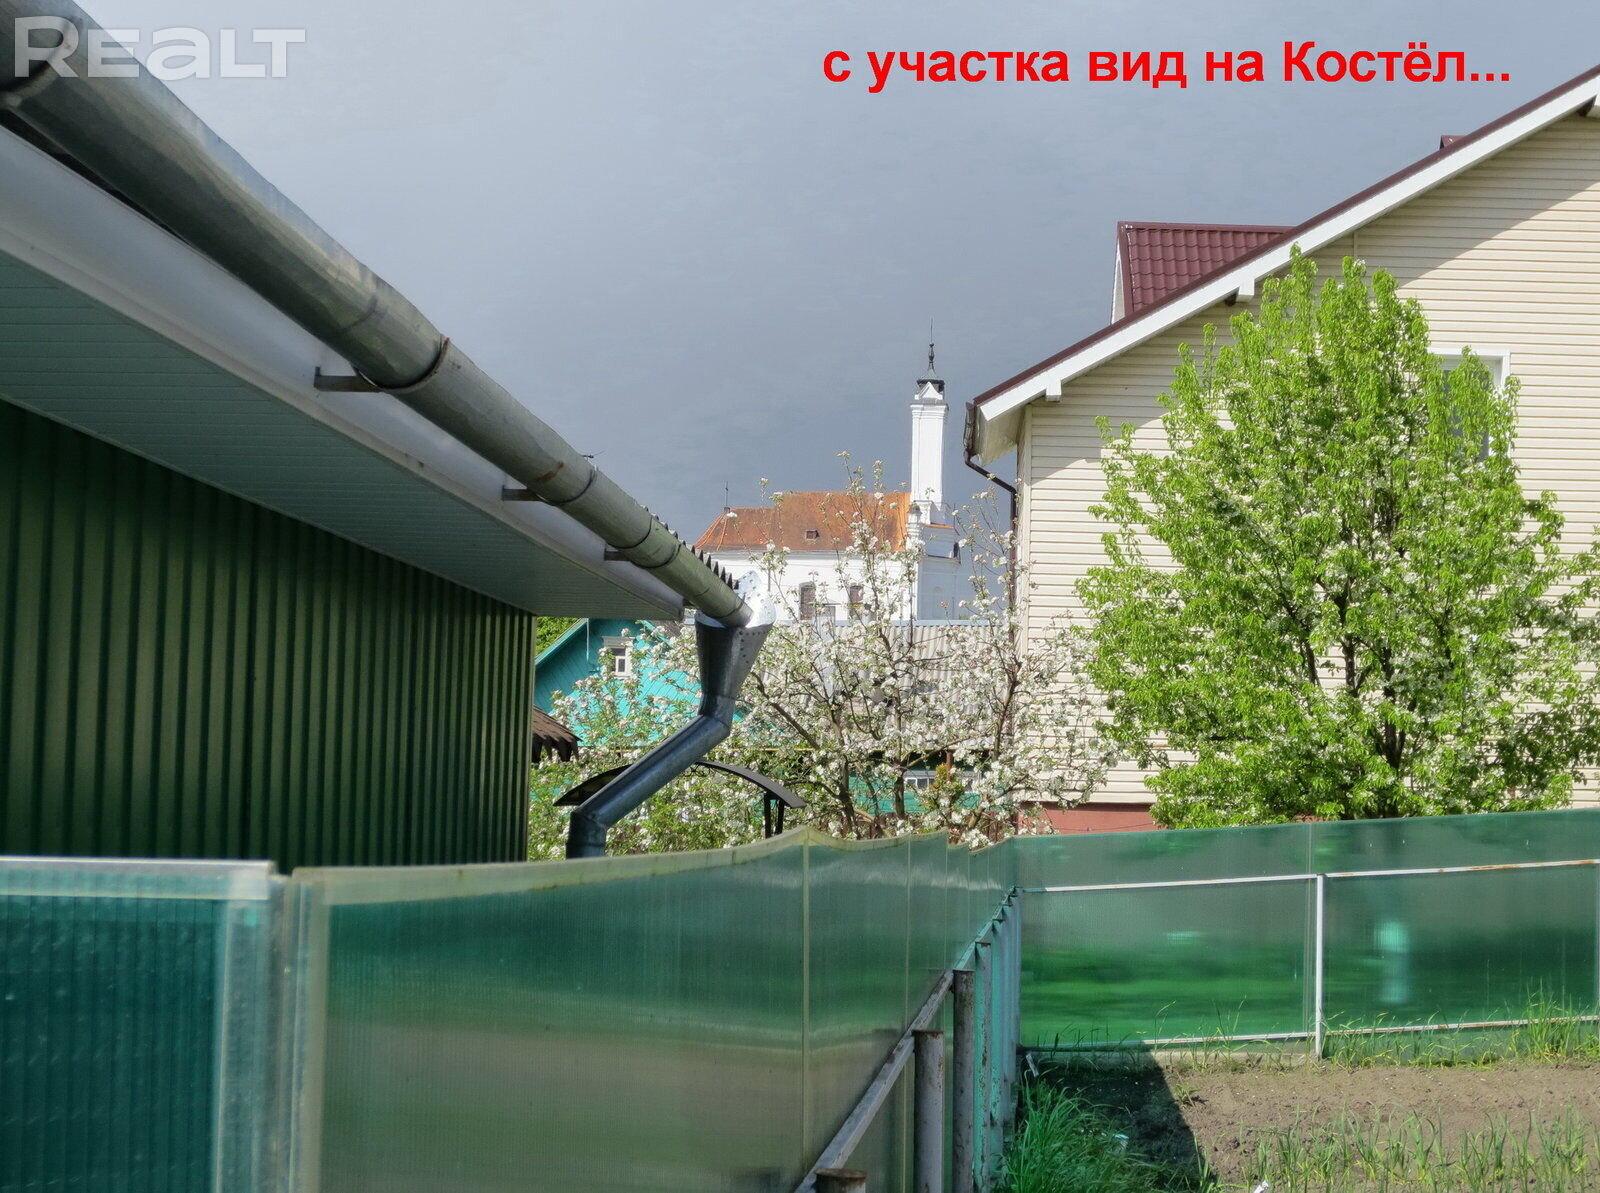 Продается 2-х комнатная квартира, Заславль - фото №12